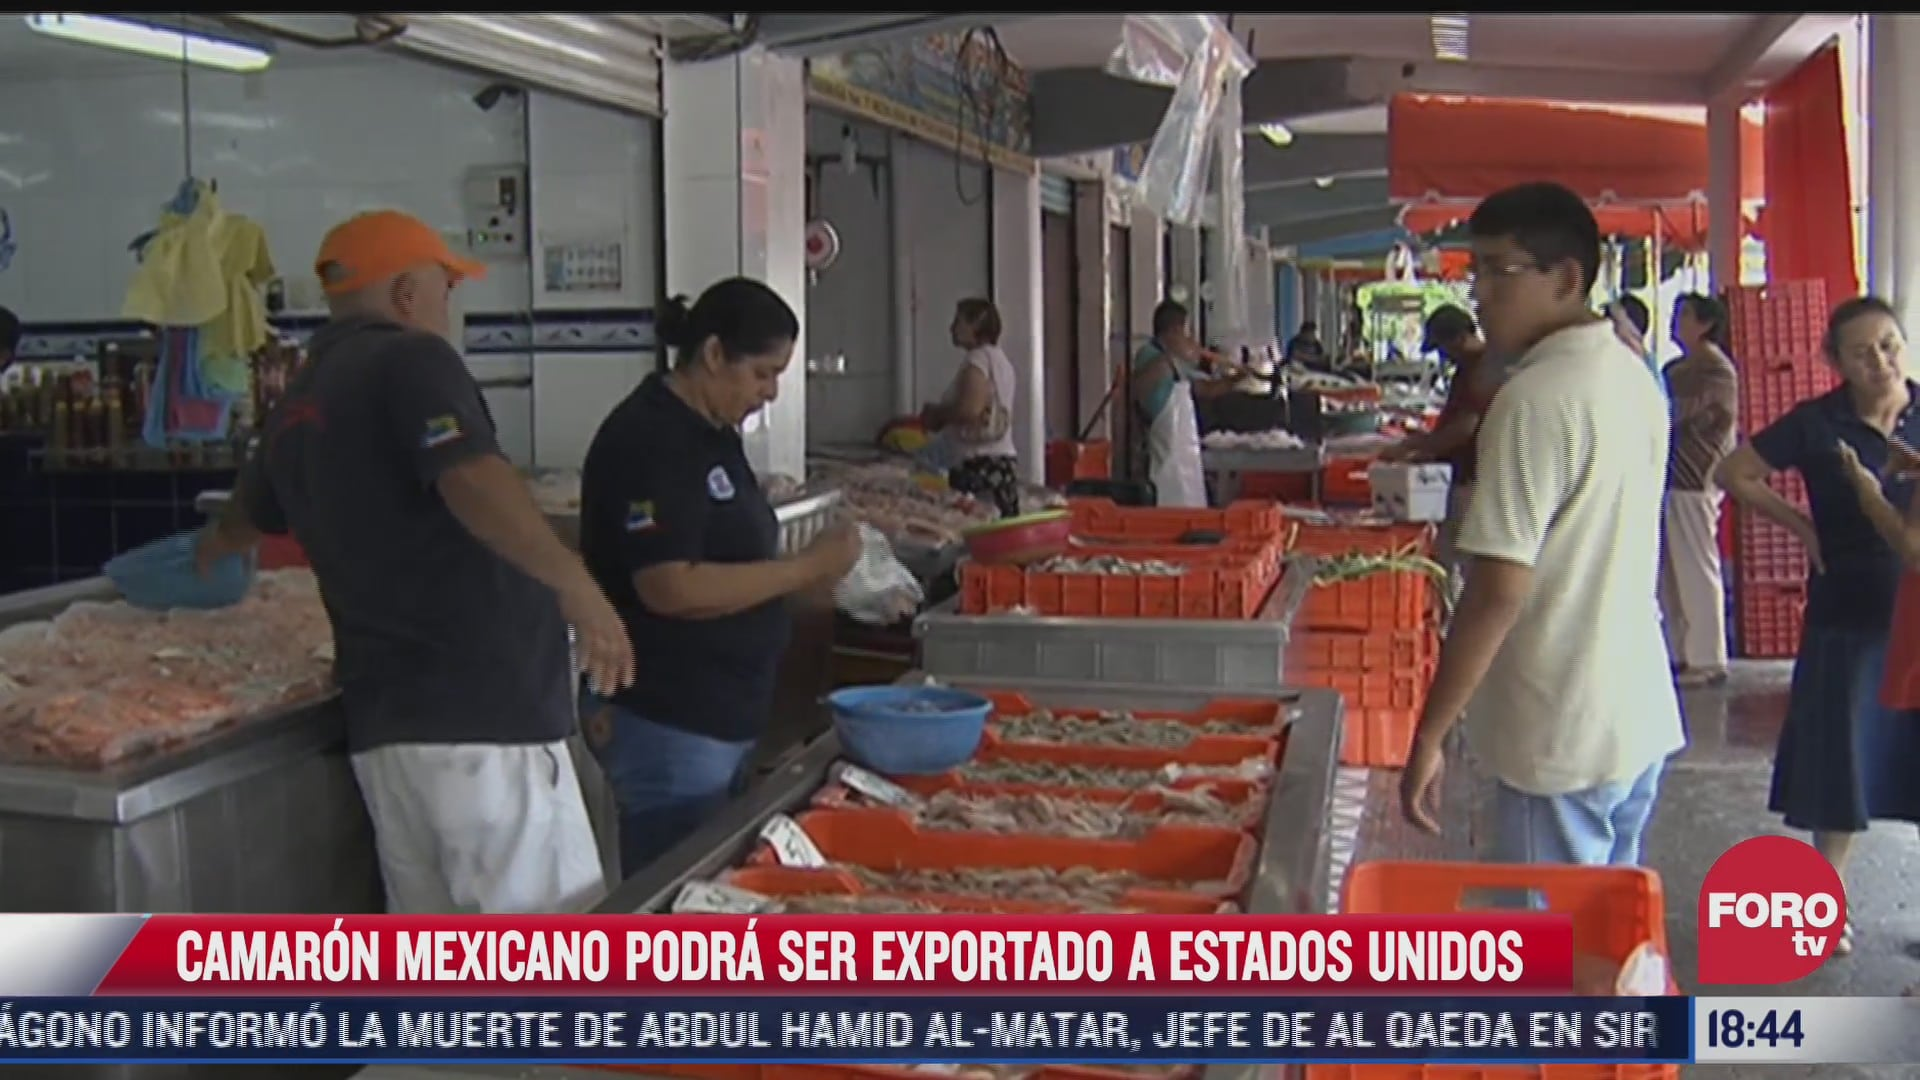 camaron mexicano podra ser exportado a estados unidos